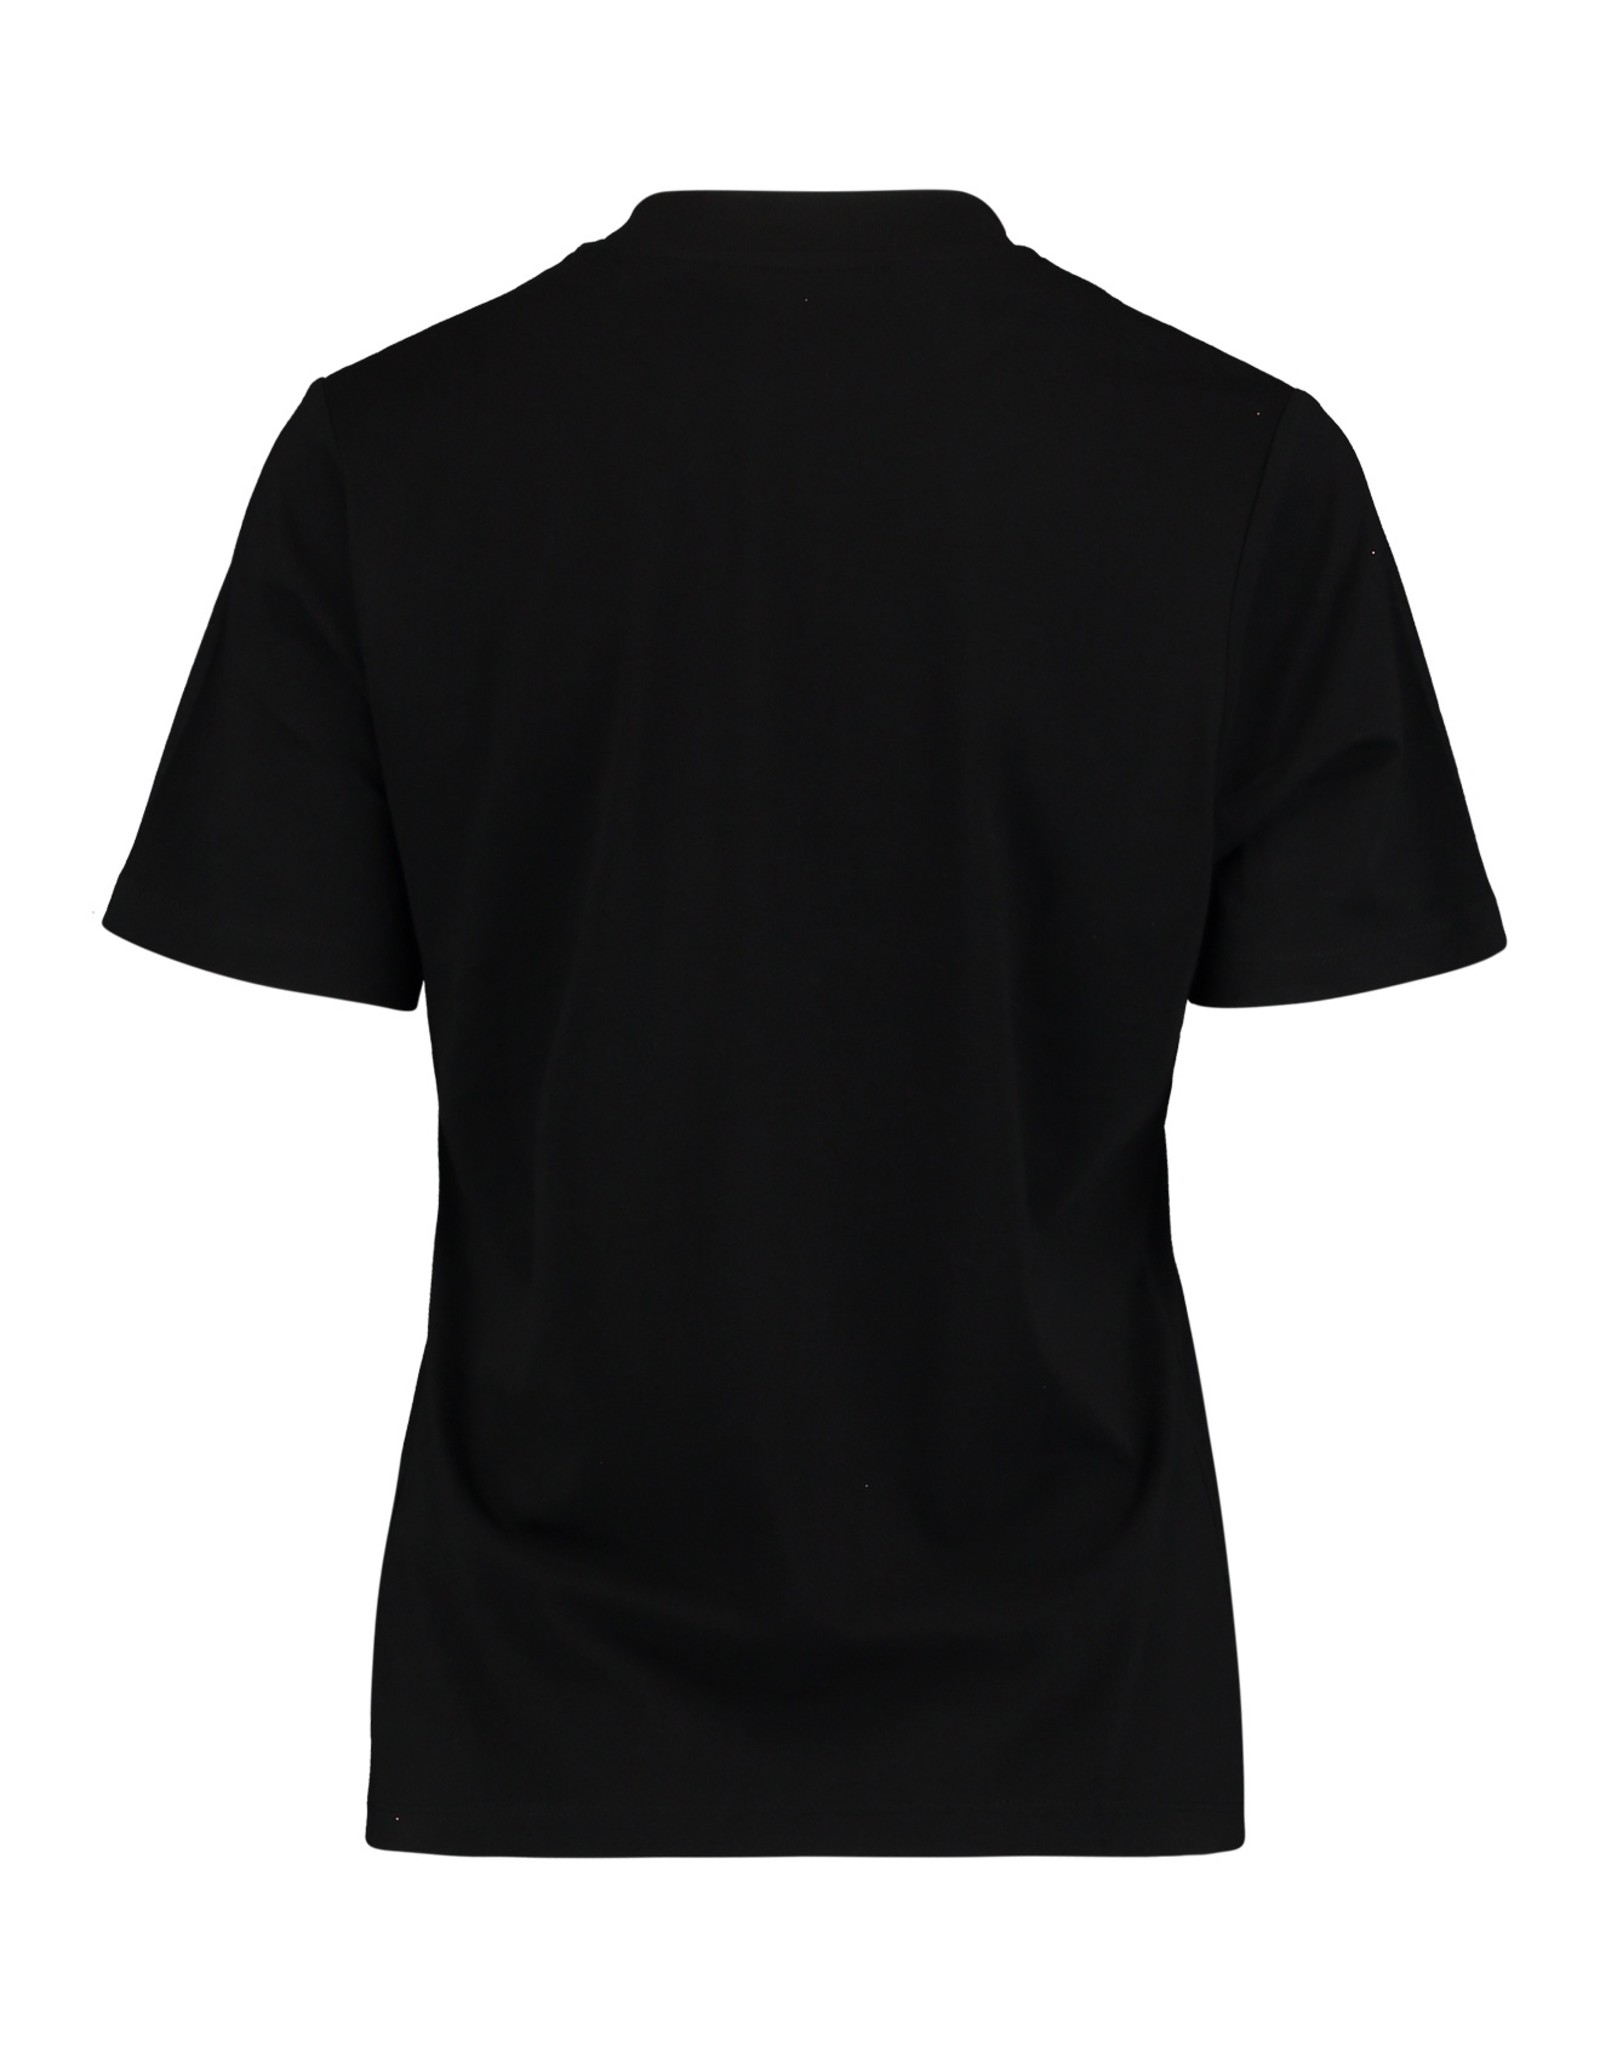 Zabaione T-shirt Ricky Black